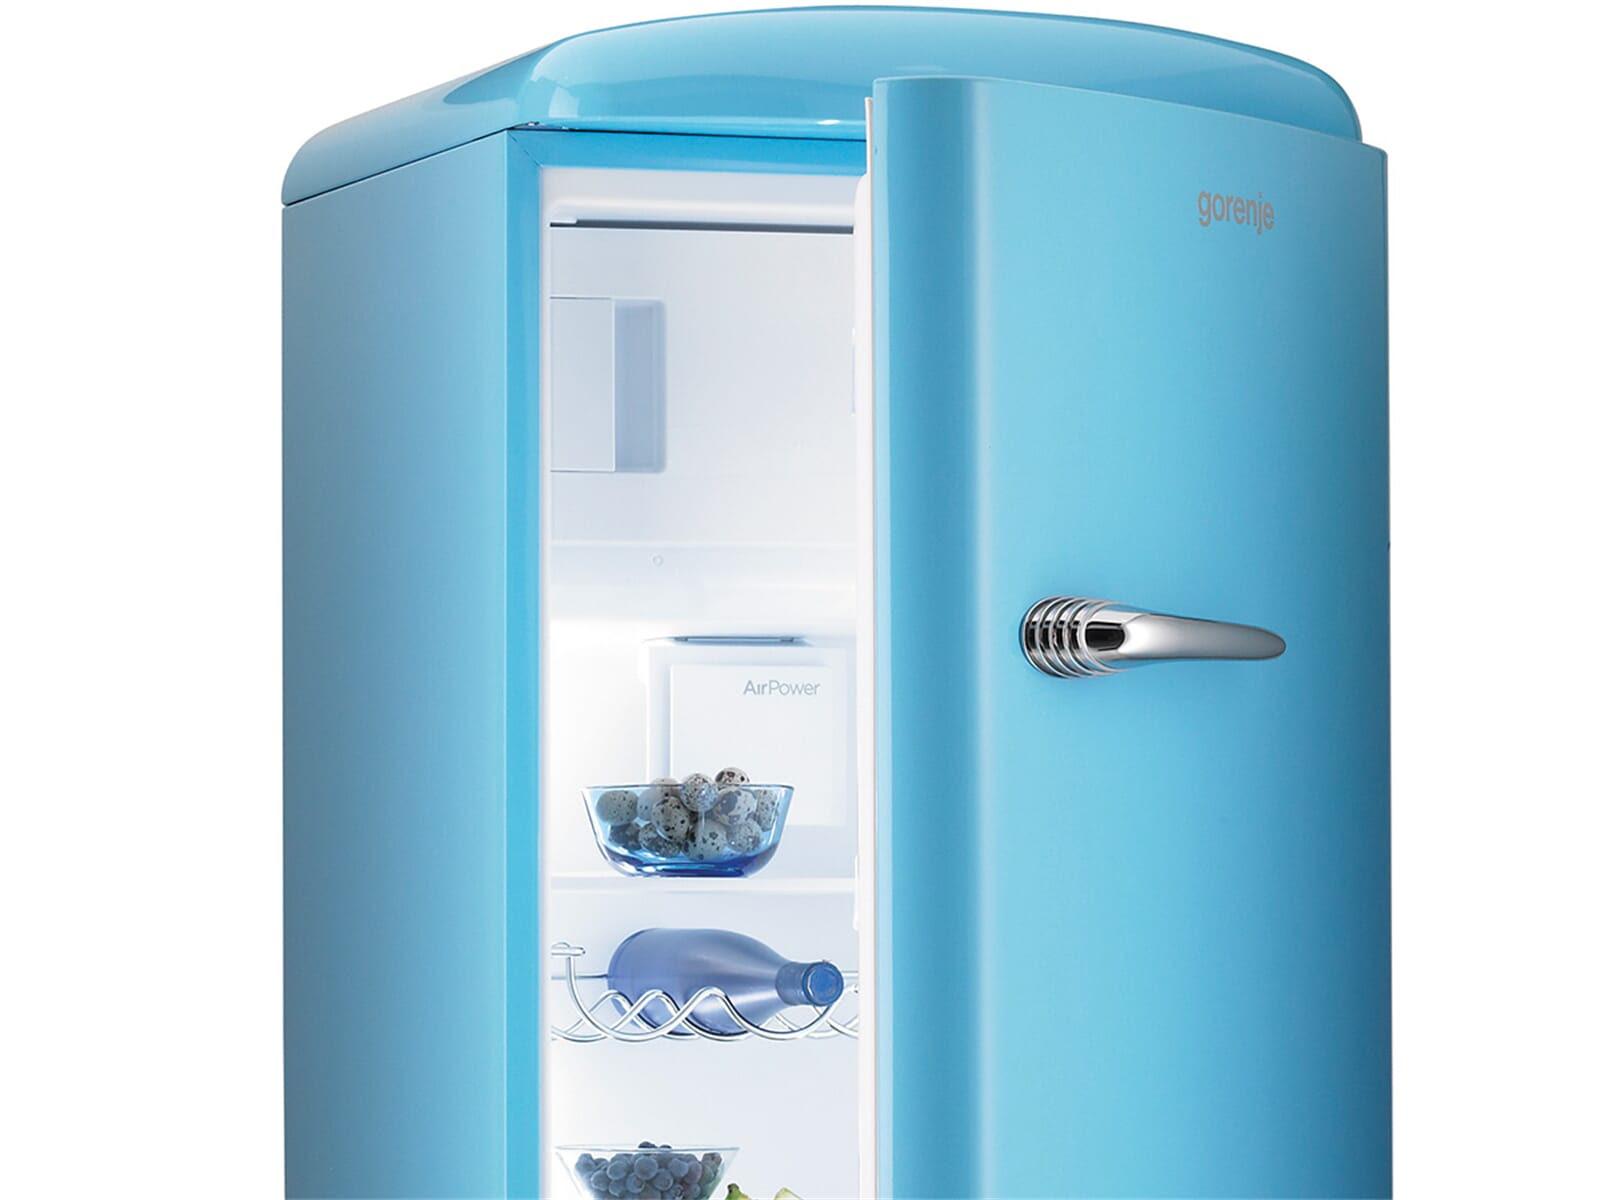 Aldi Mini Kühlschrank : Kühlschrank gorenje hts marjorie anderson